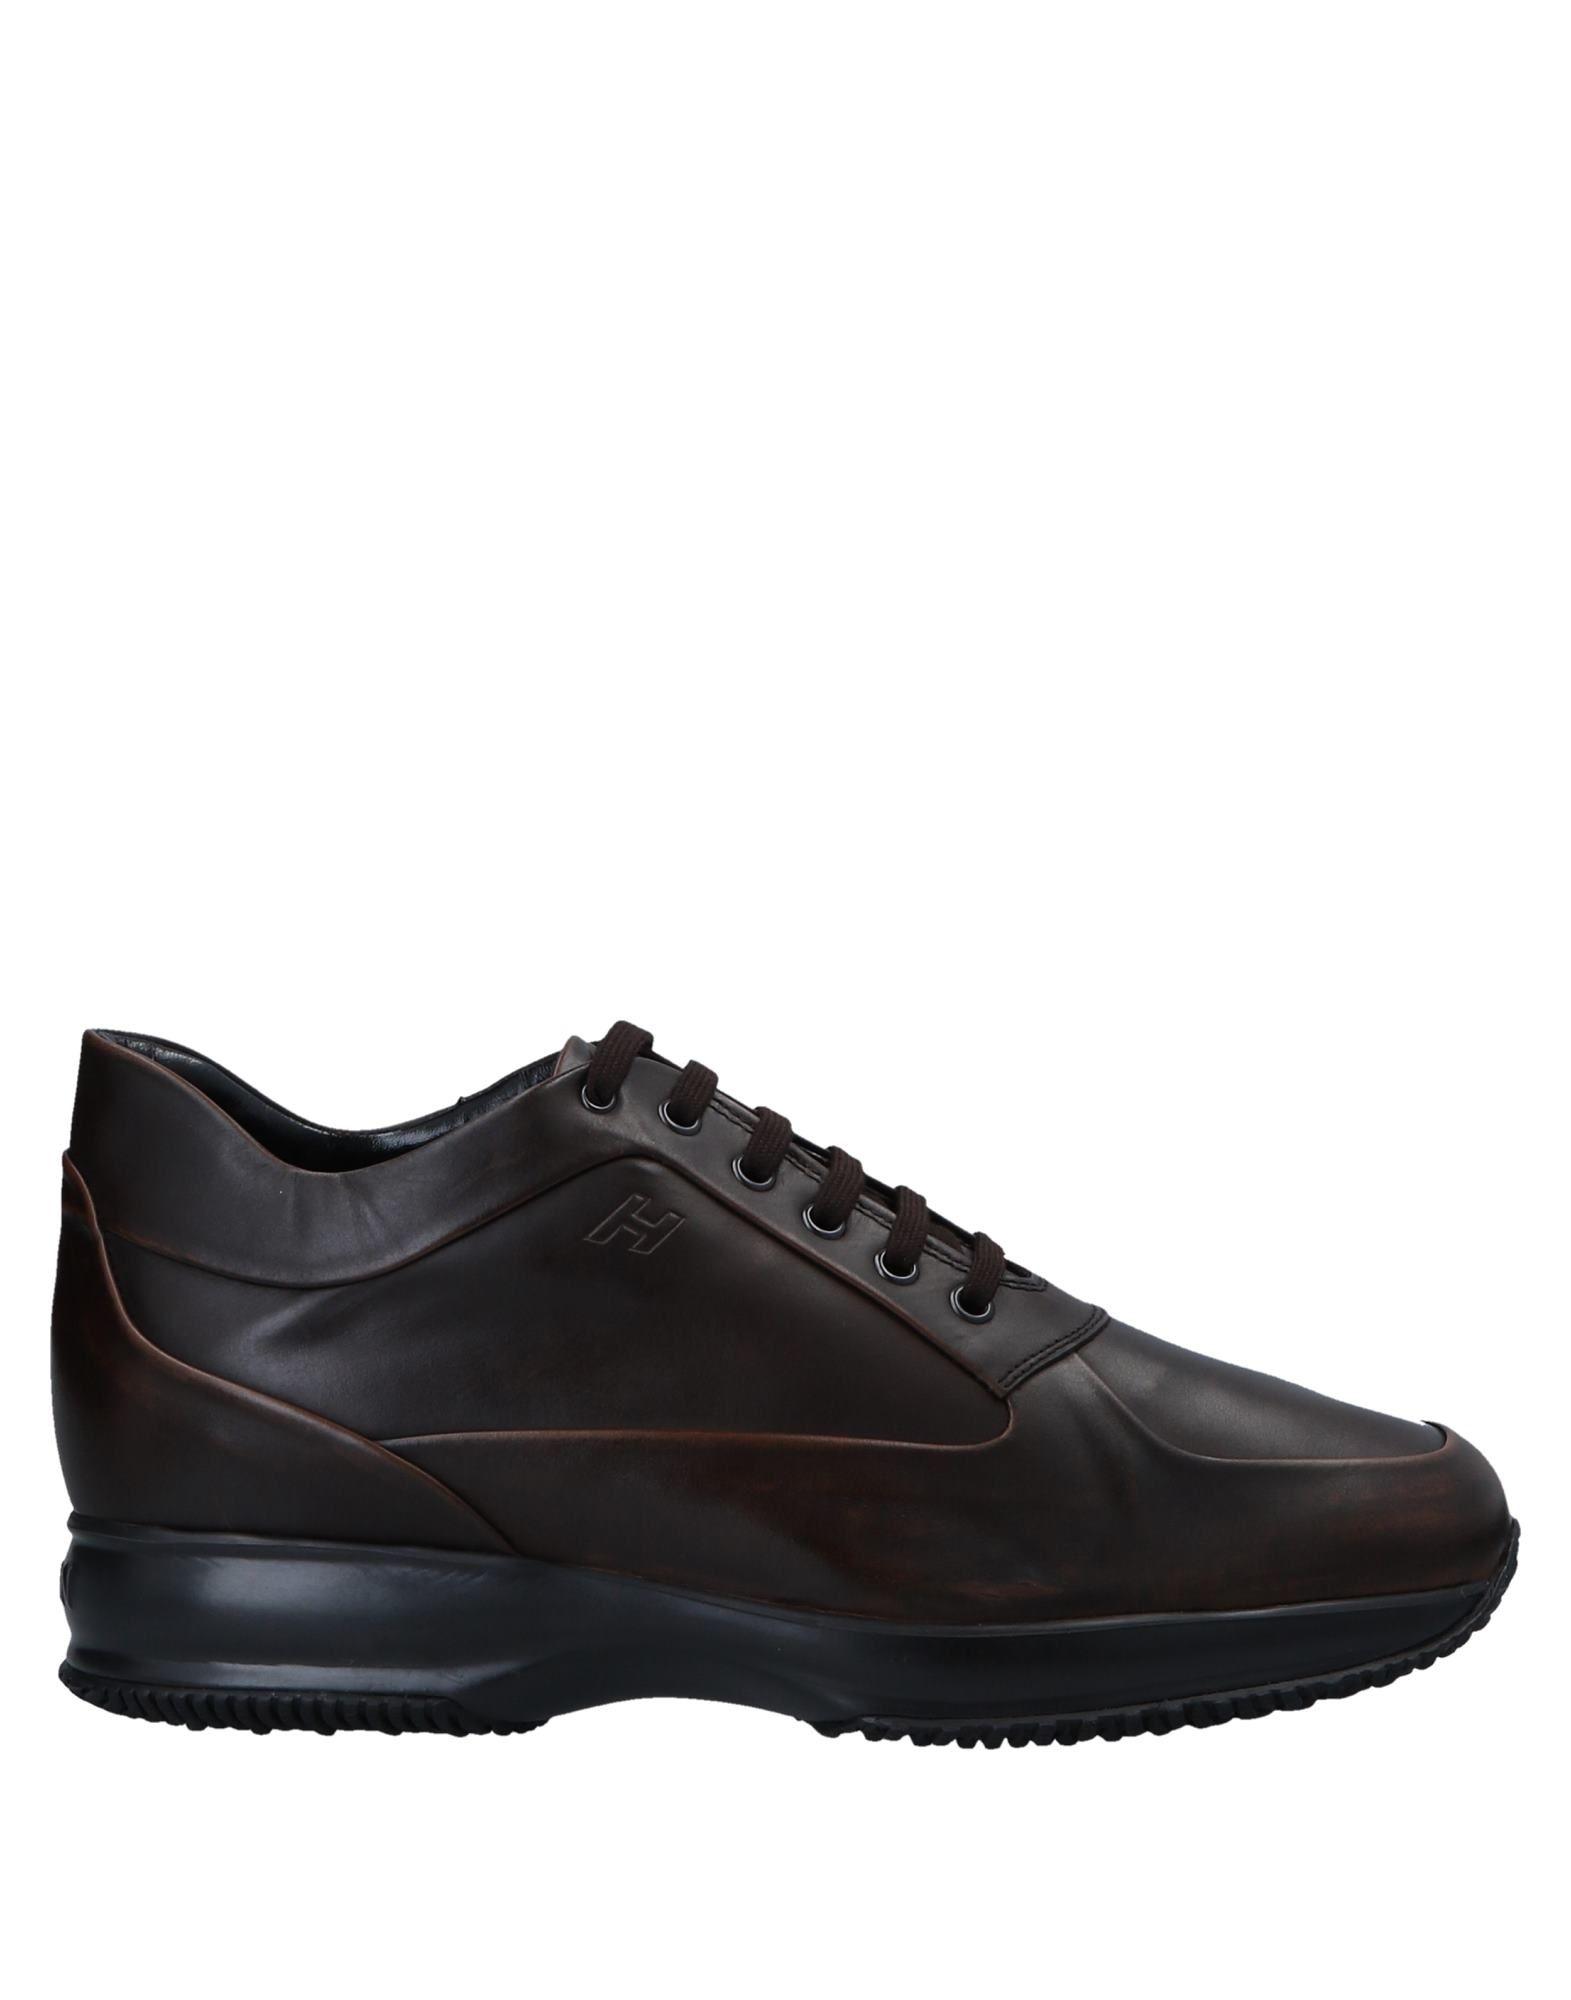 Hogan Sneakers Herren  11560276MD Gute Qualität beliebte Schuhe